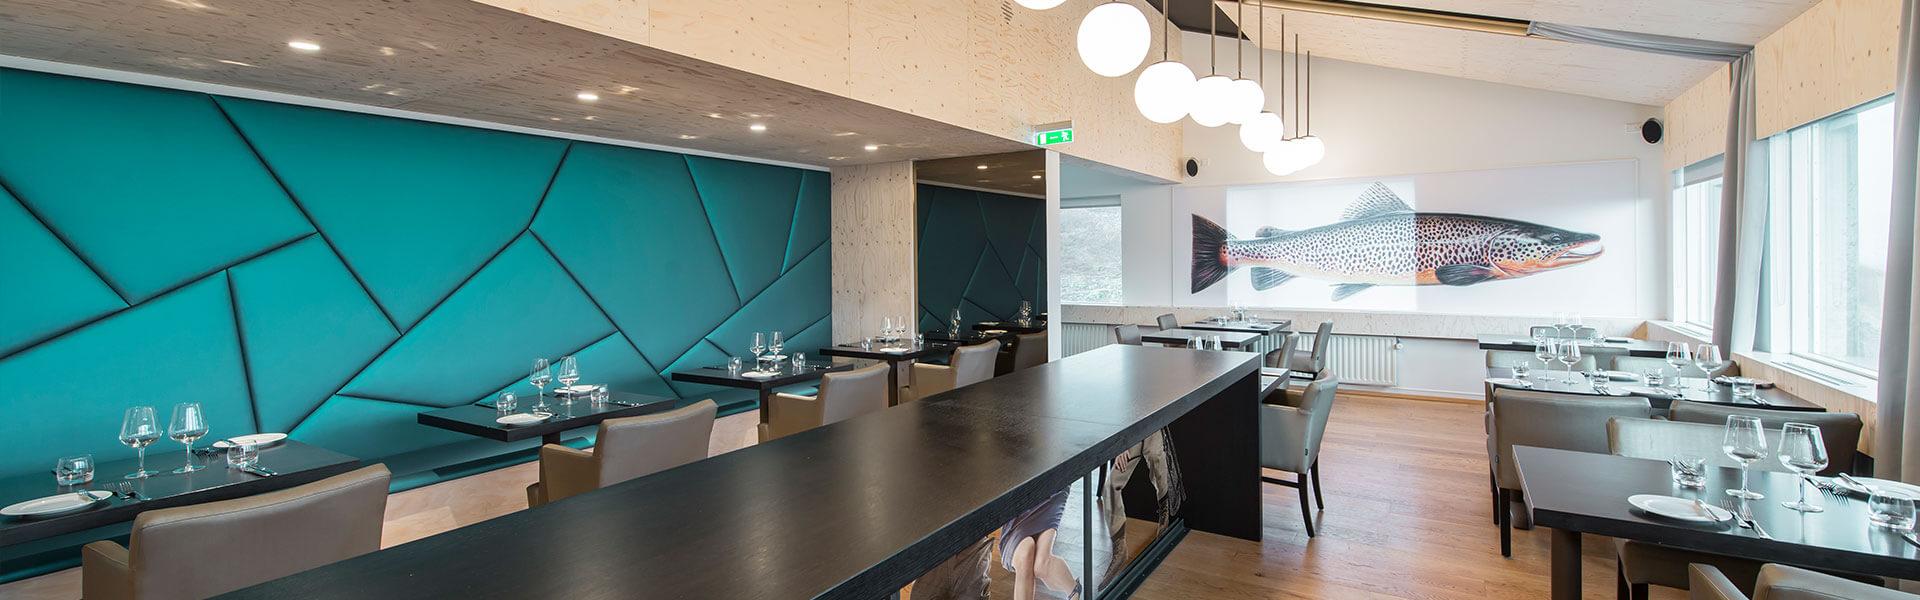 ION Hotel - Restaurant